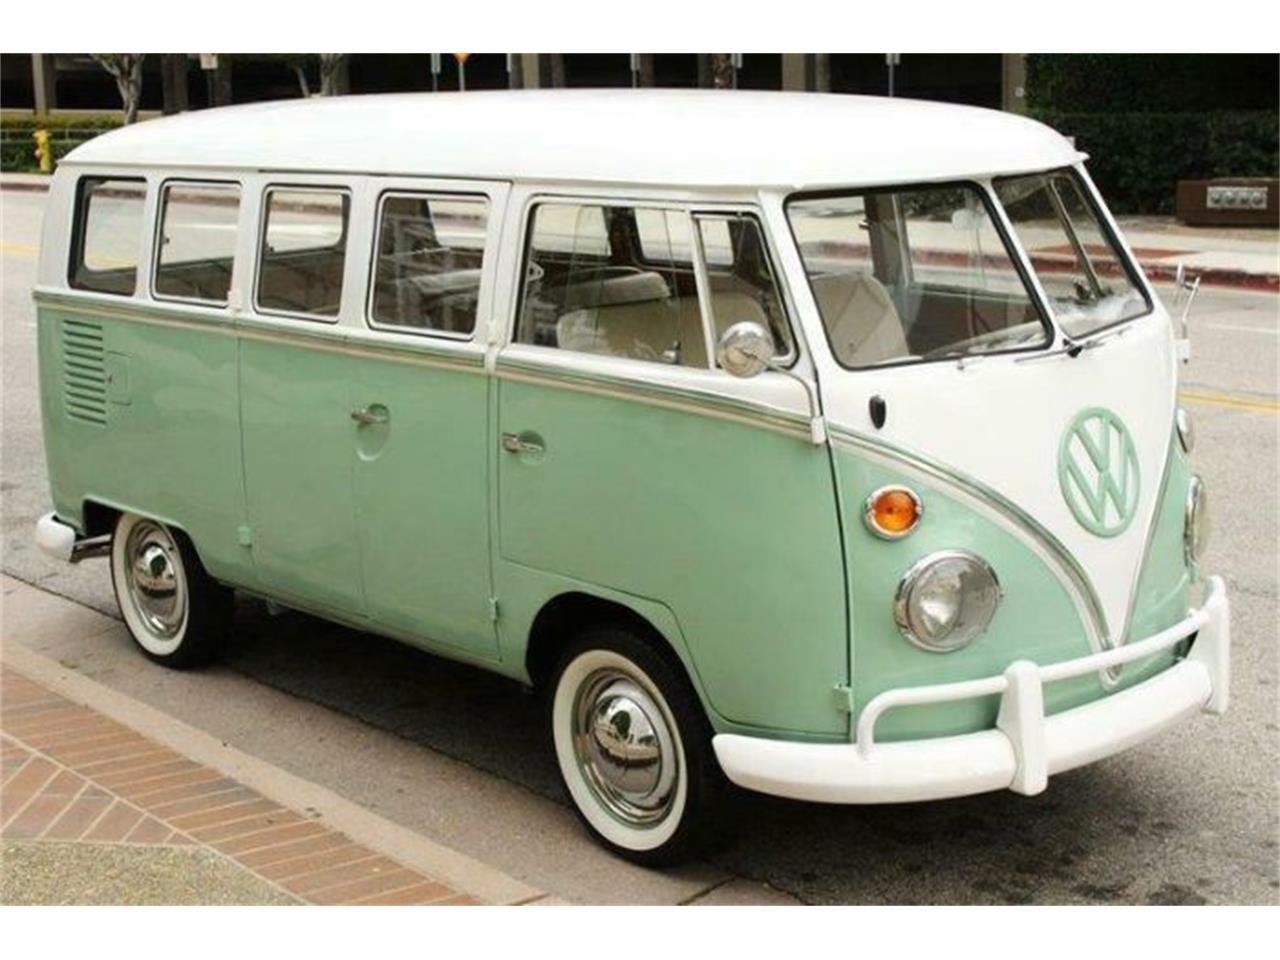 1965 Volkswagen Bus For Sale Classiccars Com Cc 1208268